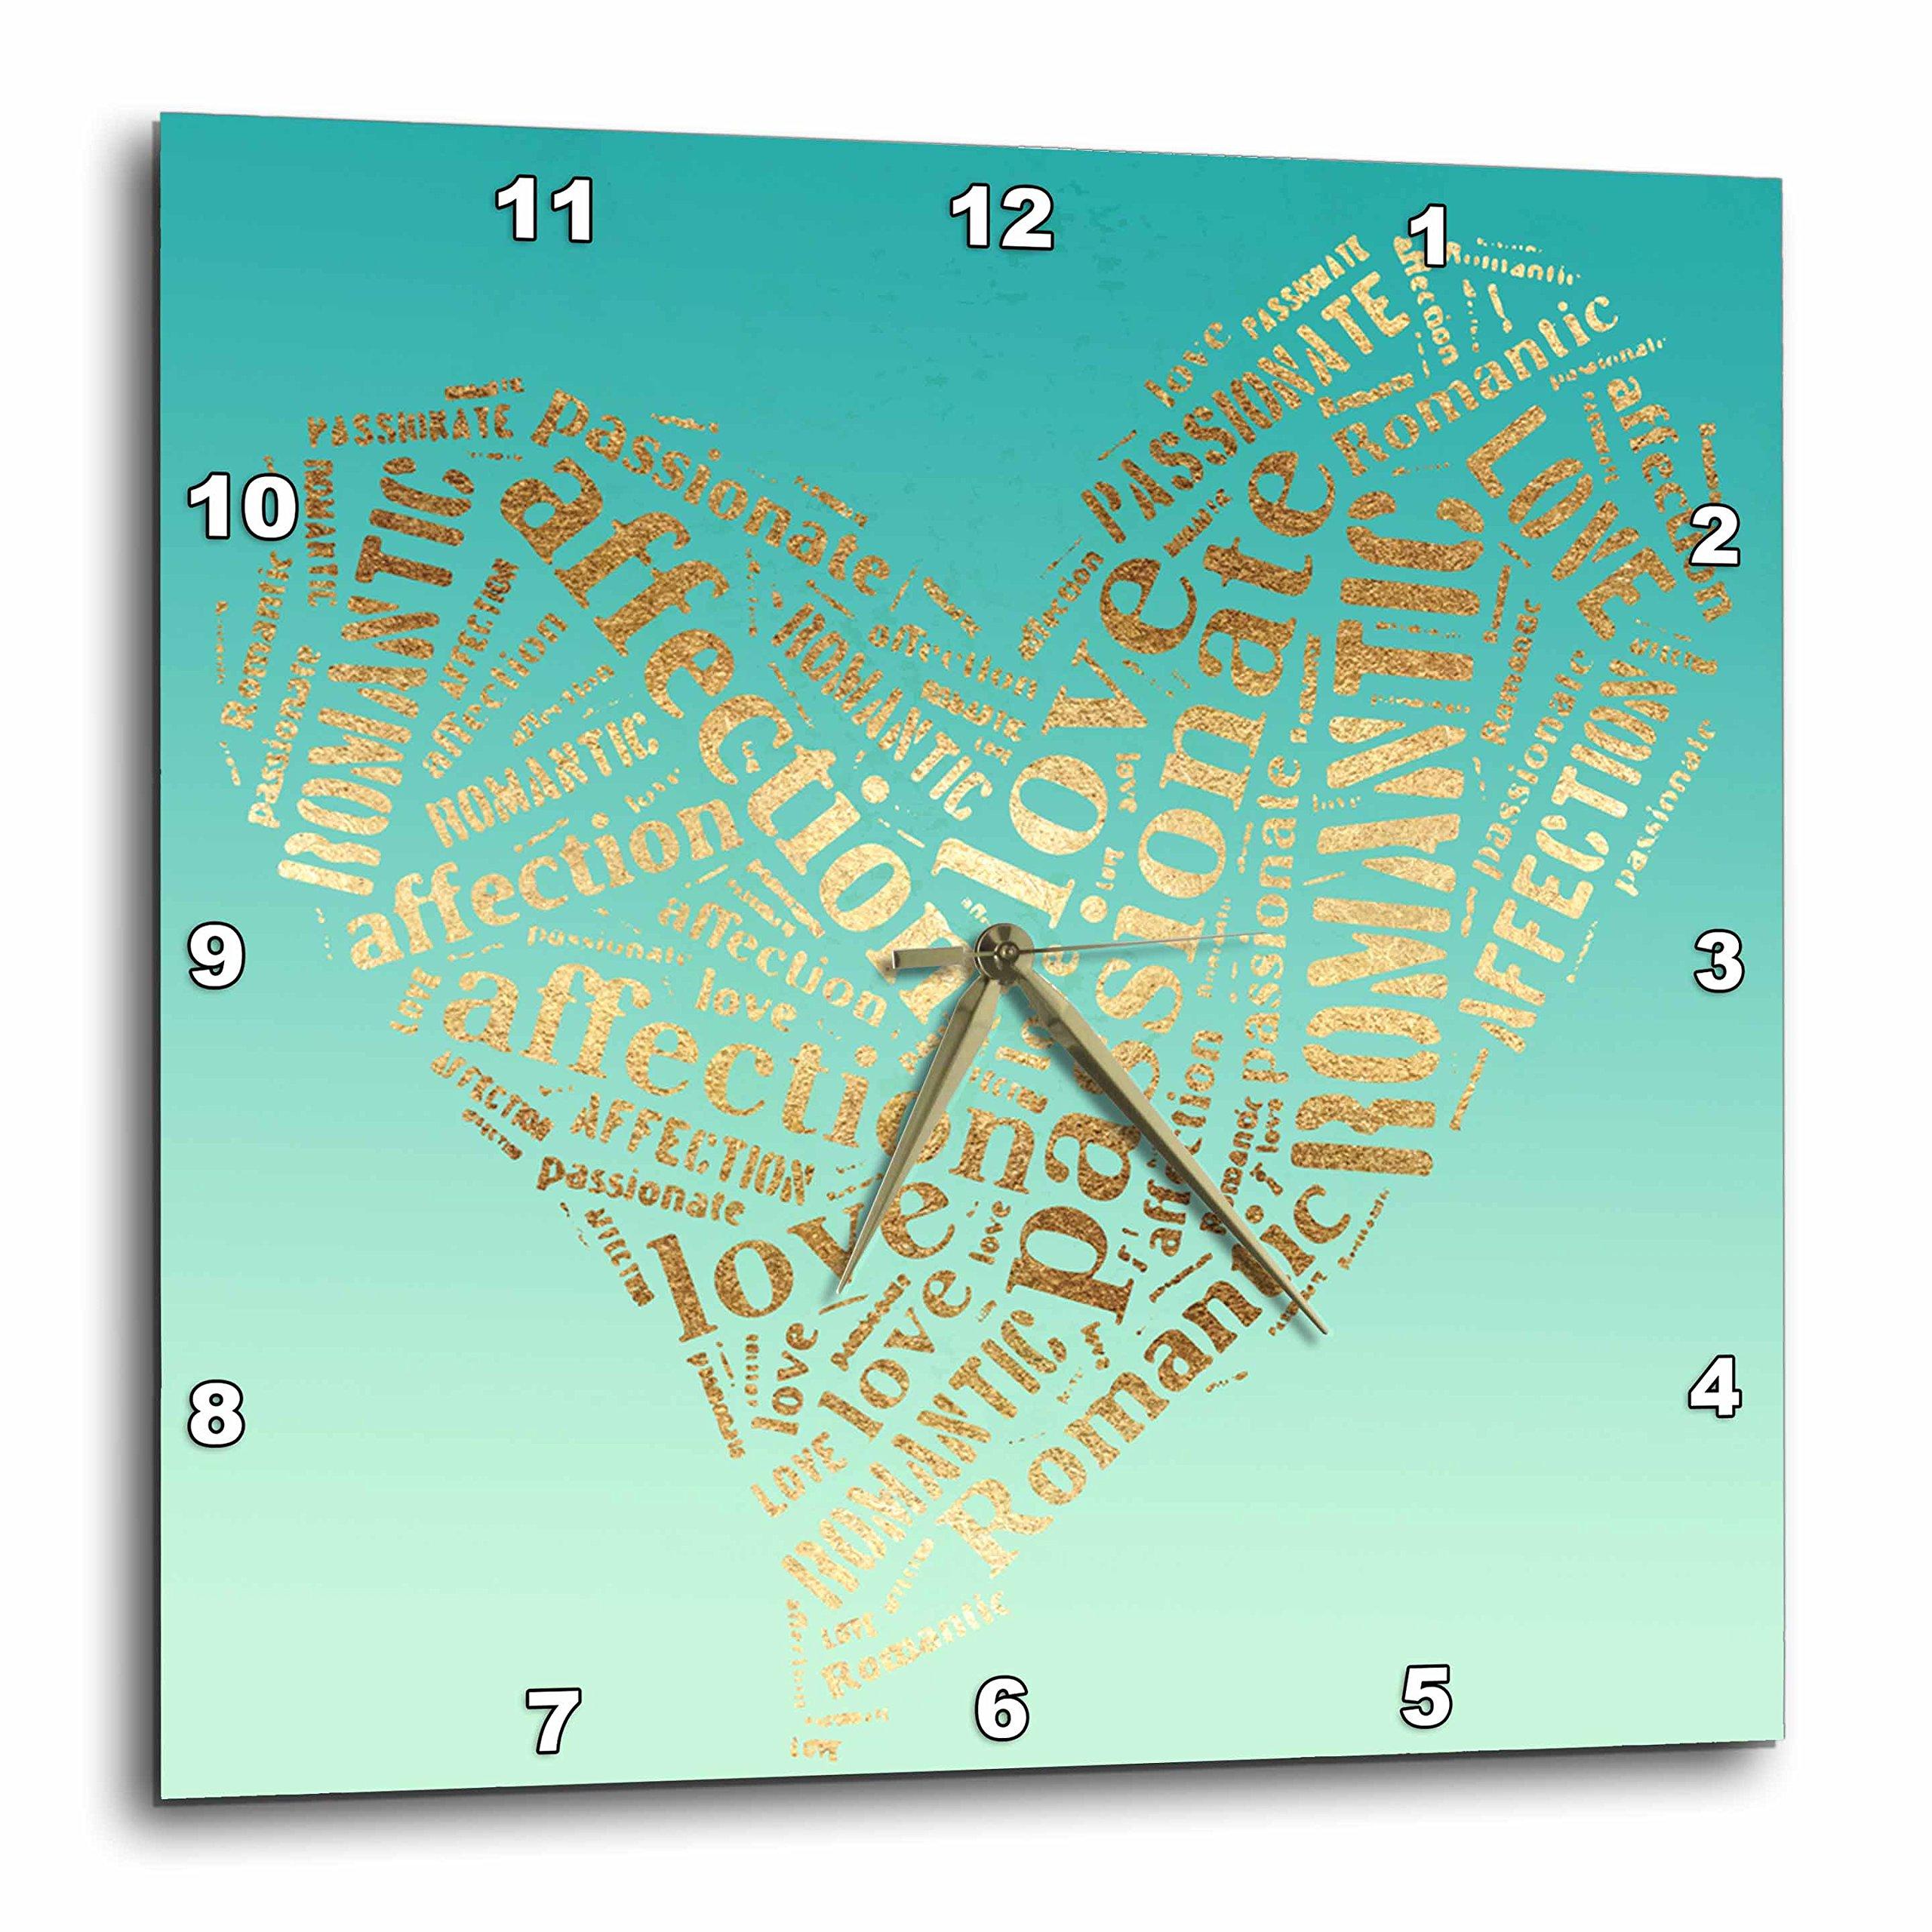 3dRose PS Inspiration - Image of Mint Green Gold Inspirational Words Heart - 10x10 Wall Clock (dpp_280736_1)